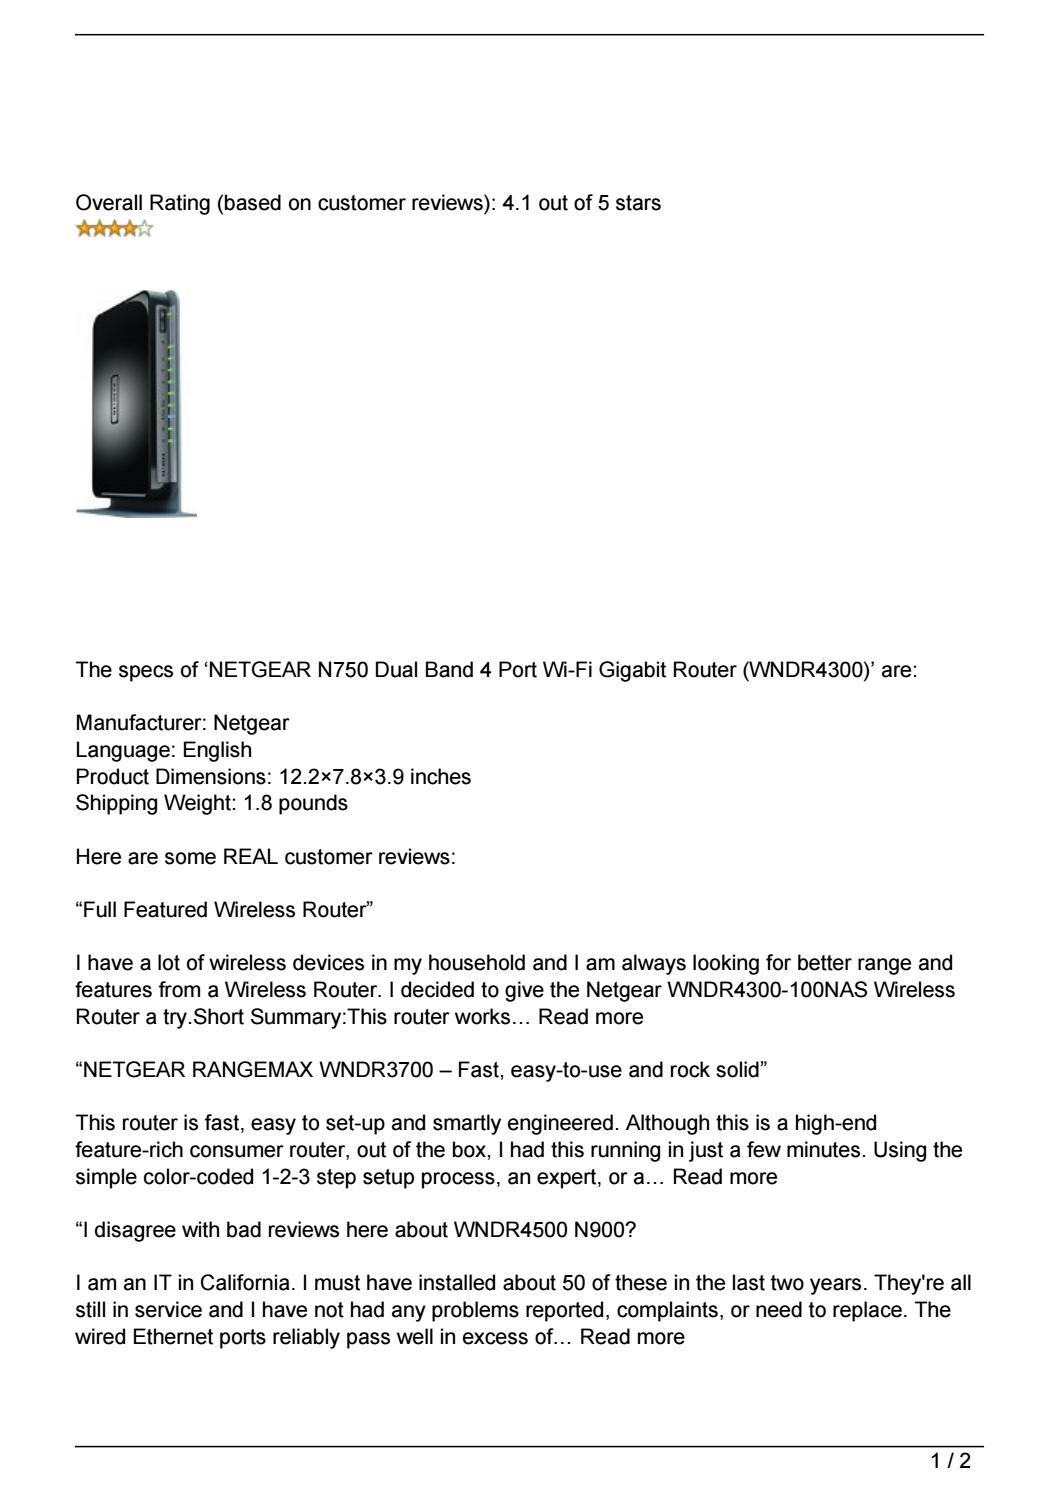 NETGEAR N750 Dual Band 4 Port Wi-Fi Gigabit Router (WNDR4300